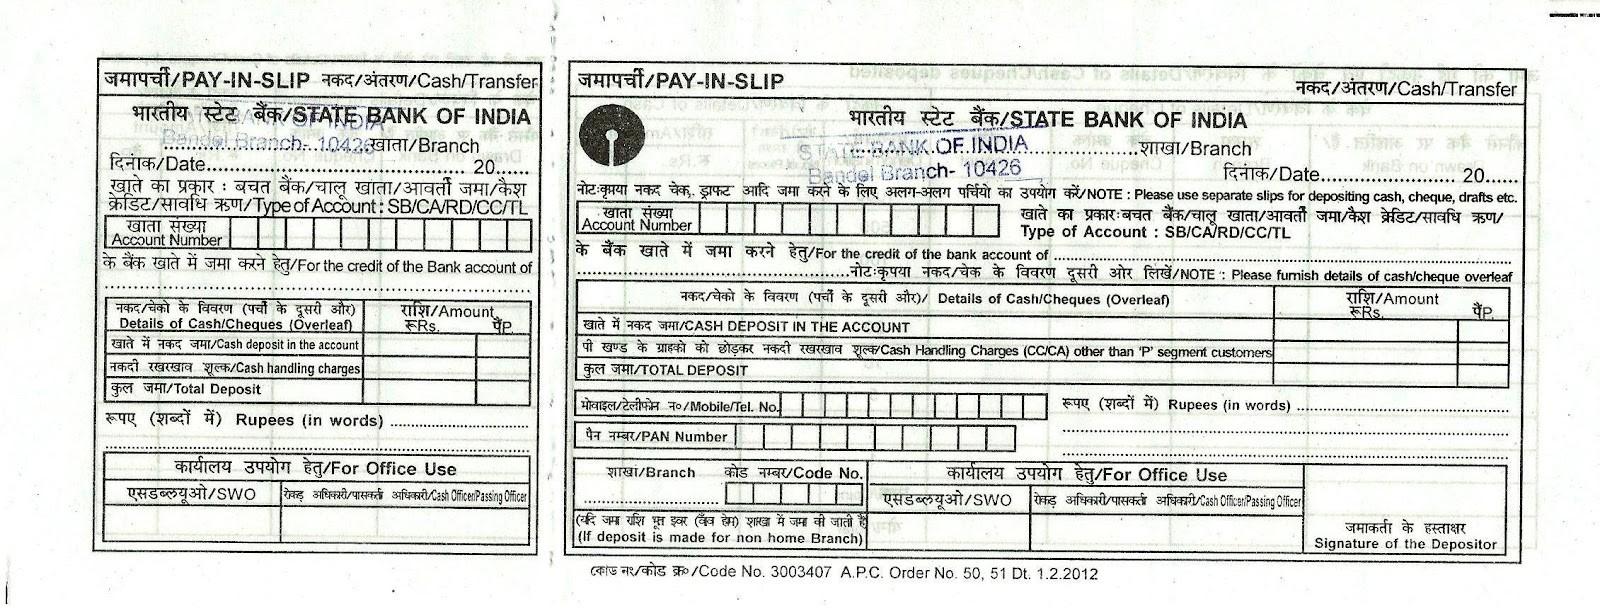 ppf deposit form state bank of india  deposit slip of sbi - ppf deposit form state bank of india